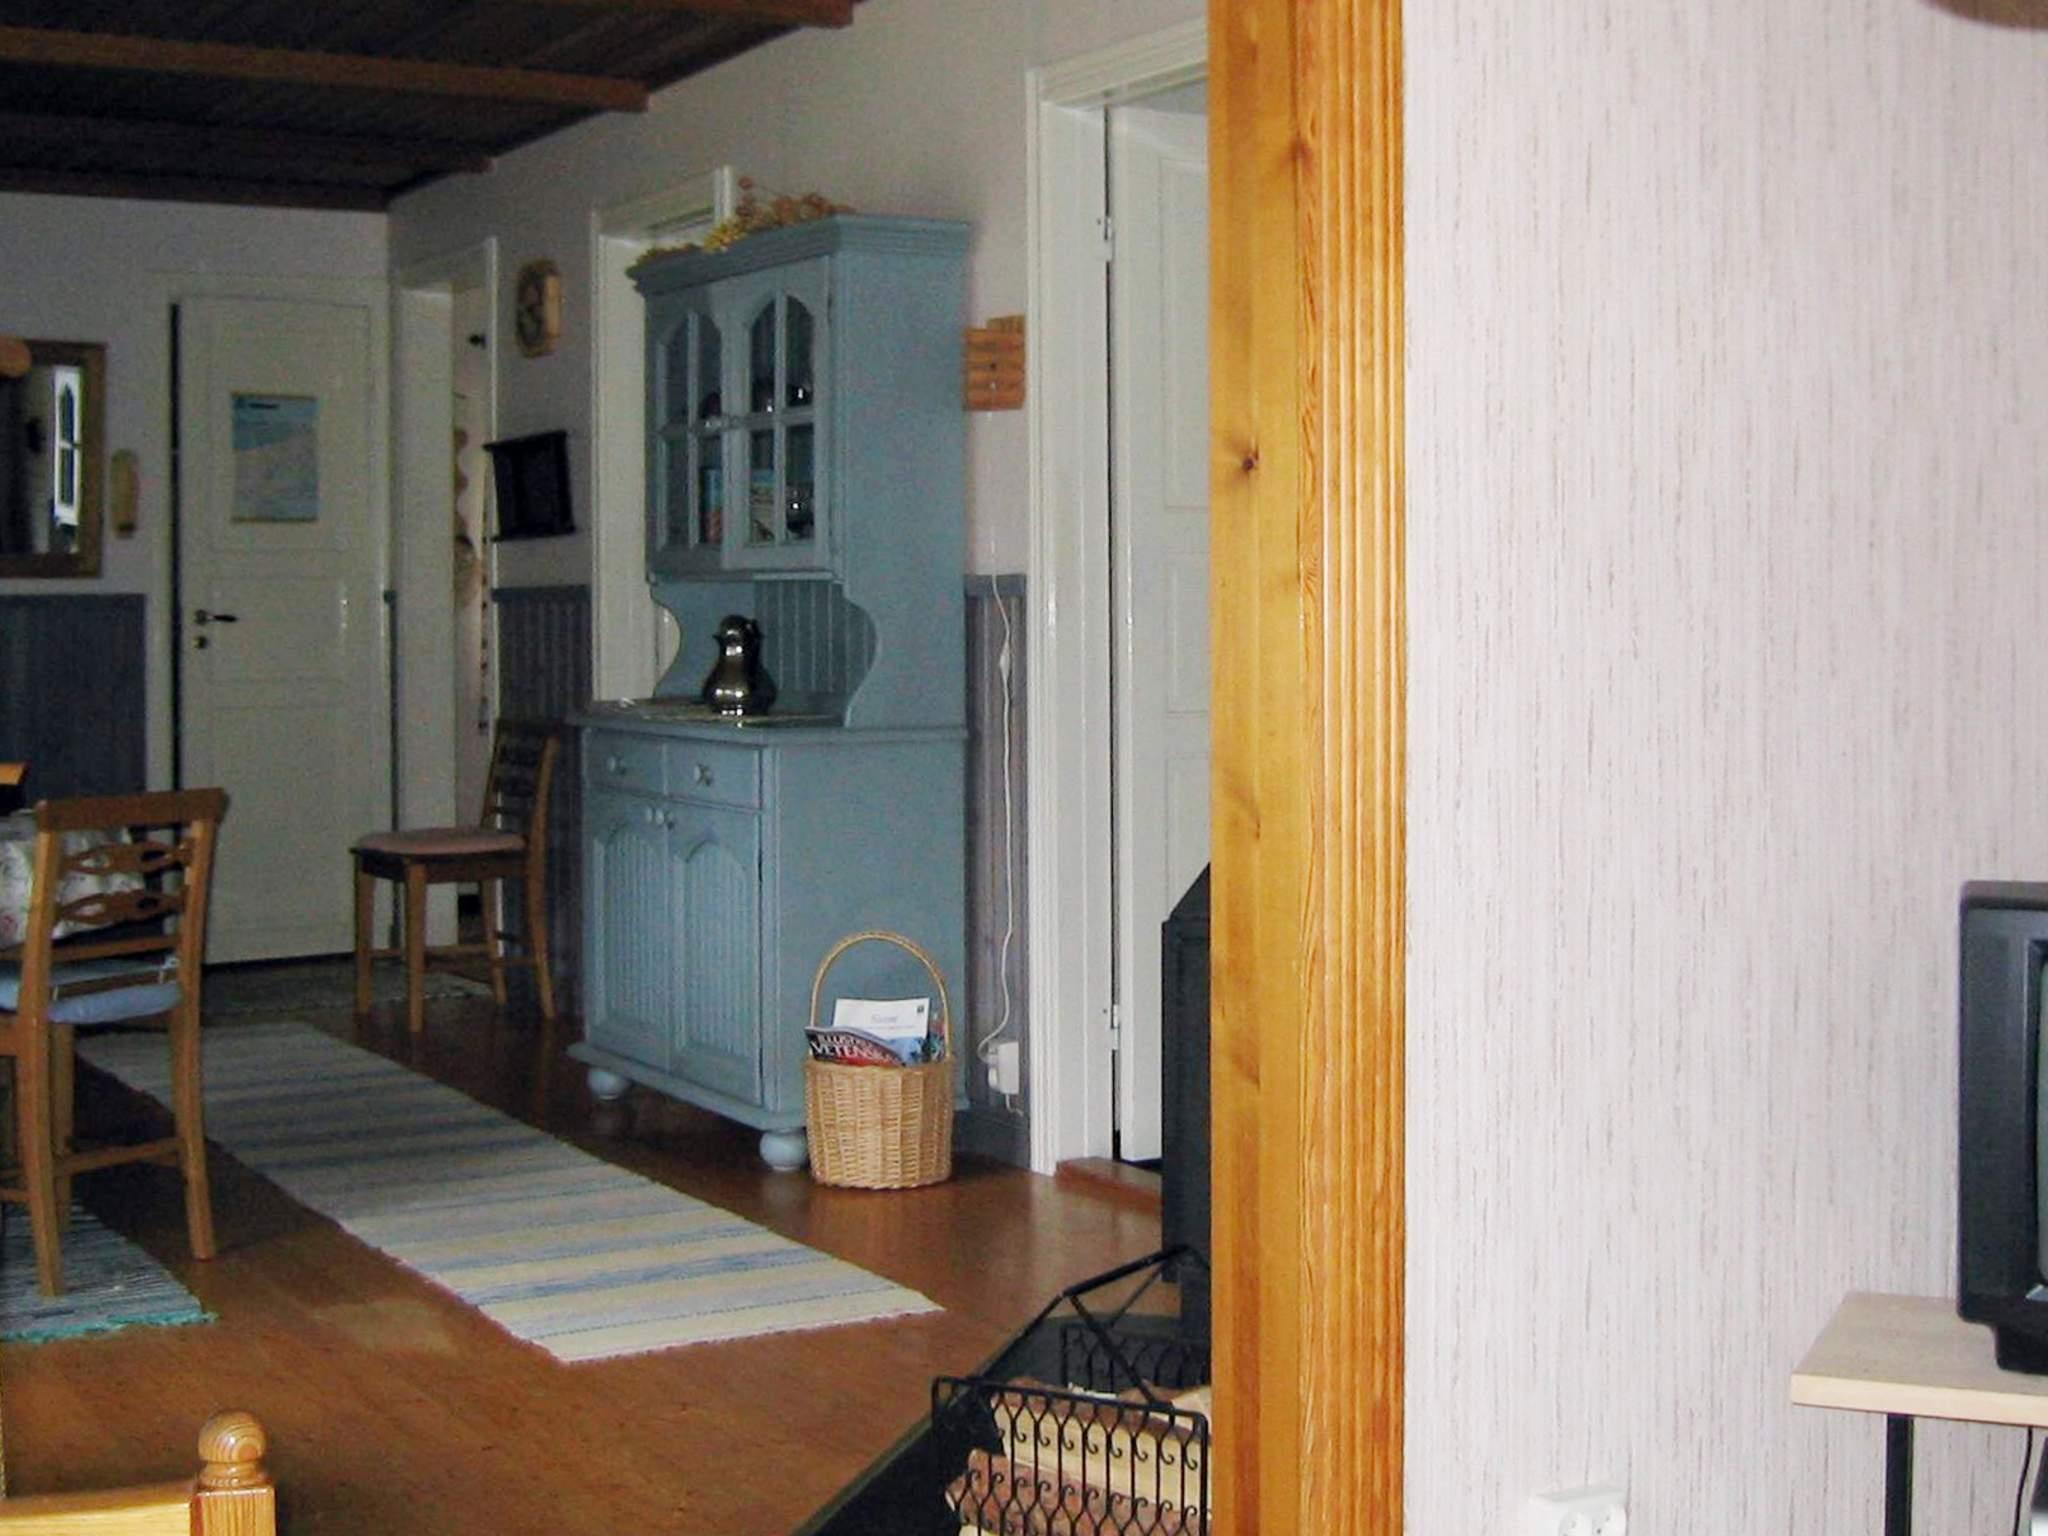 Ferienhaus Ivebo (87165), Östmark, Värmlands län, Mittelschweden, Schweden, Bild 7